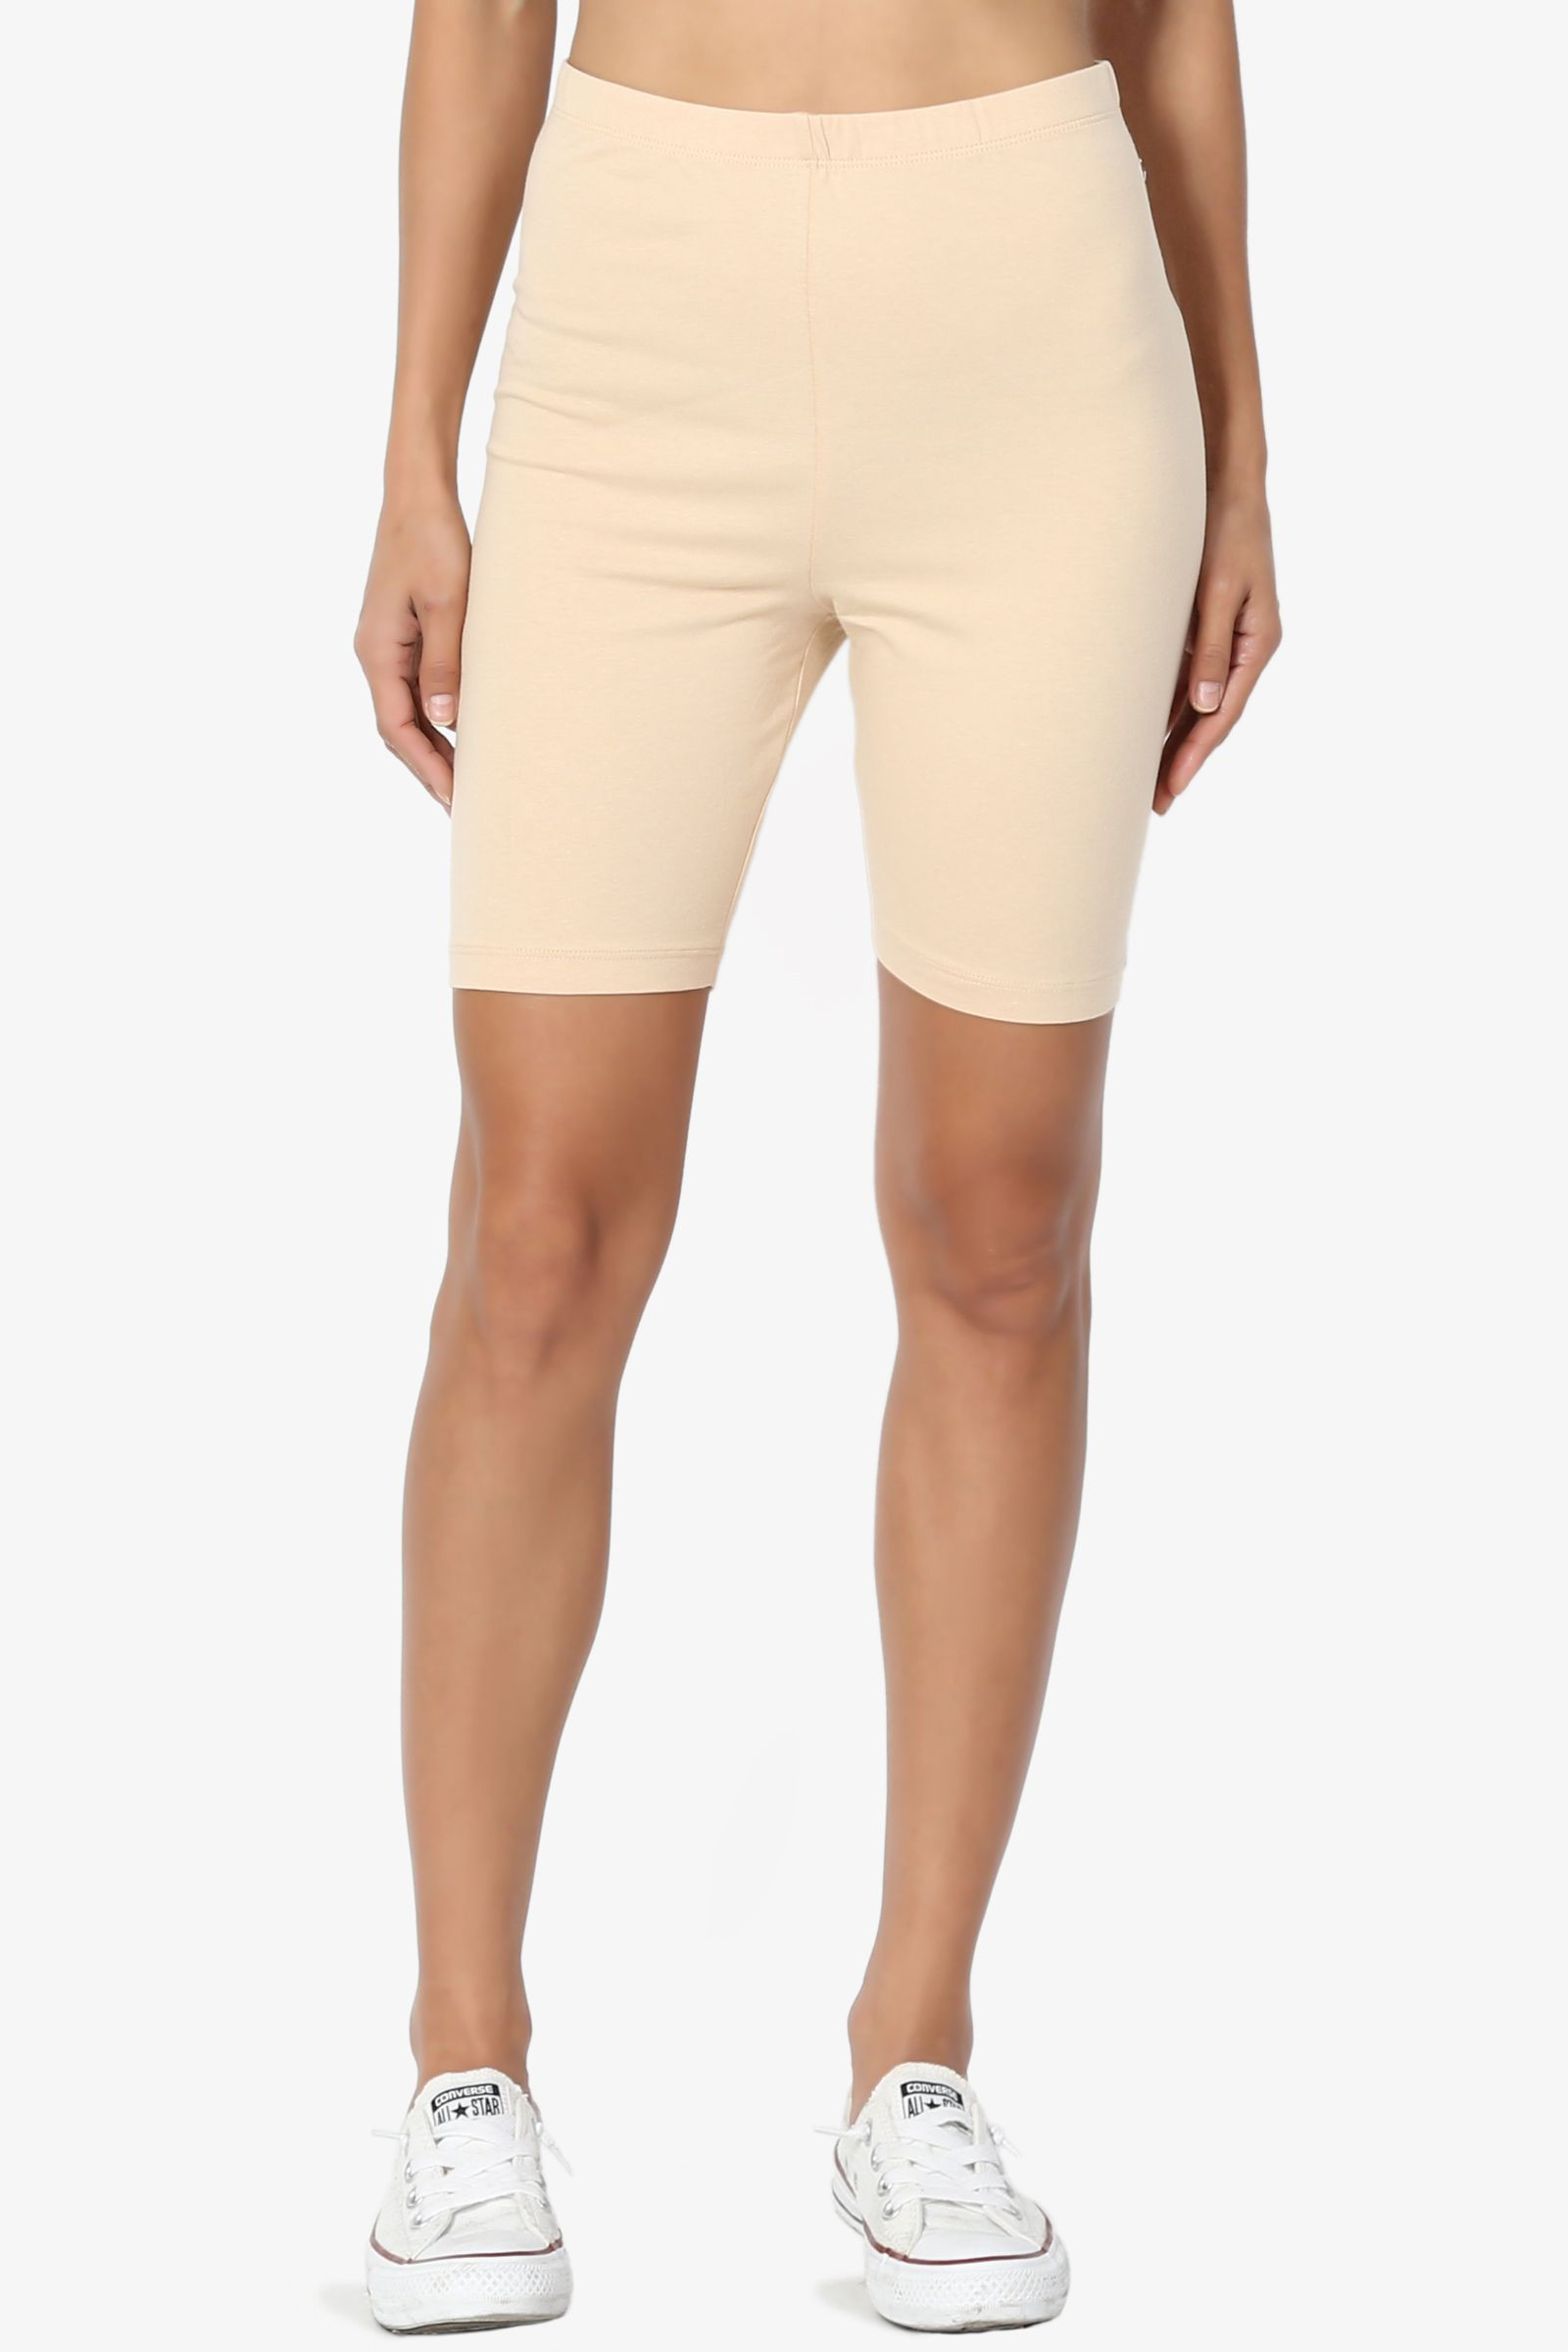 b3d5403c66c708 TheMogan Women's S~3X Mid Thigh Stretch Cotton Active Bermuda Under Short  Leggings#Thigh, #Stretch, #Mid